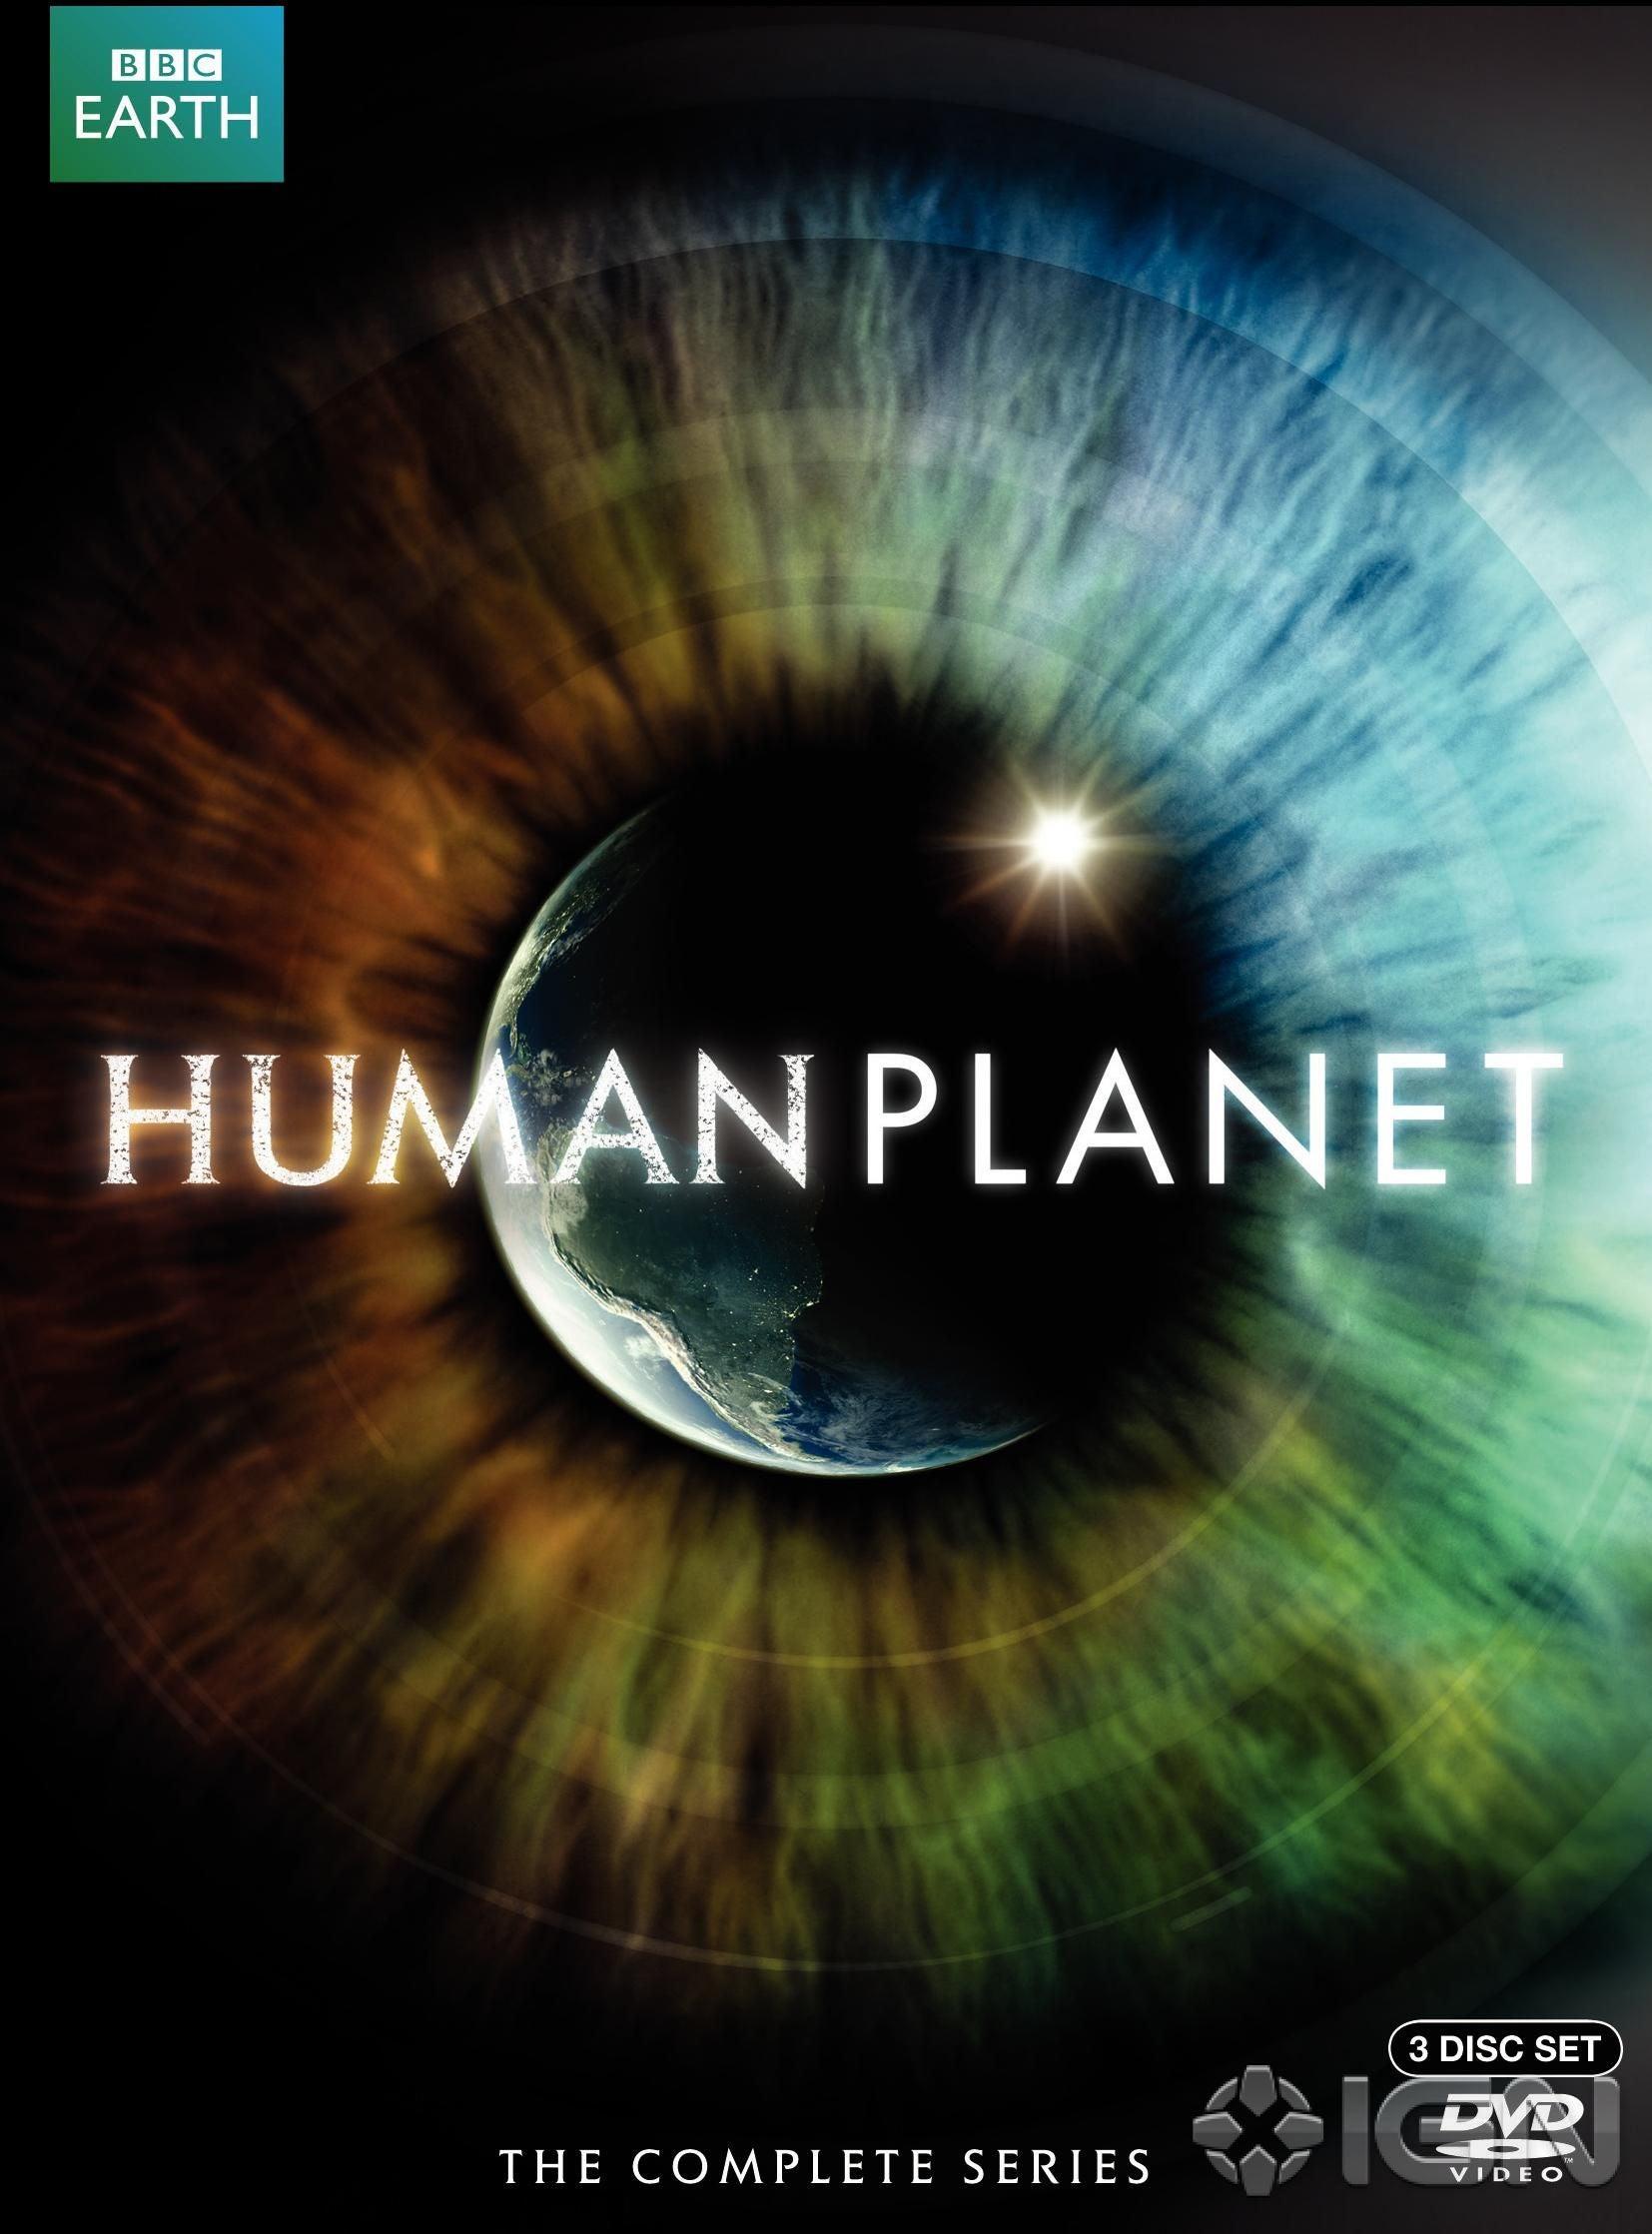 https://i0.wp.com/dvdmedia.ign.com/dvd/image/article/115/1152610/human-planet-20110228023440194.jpg